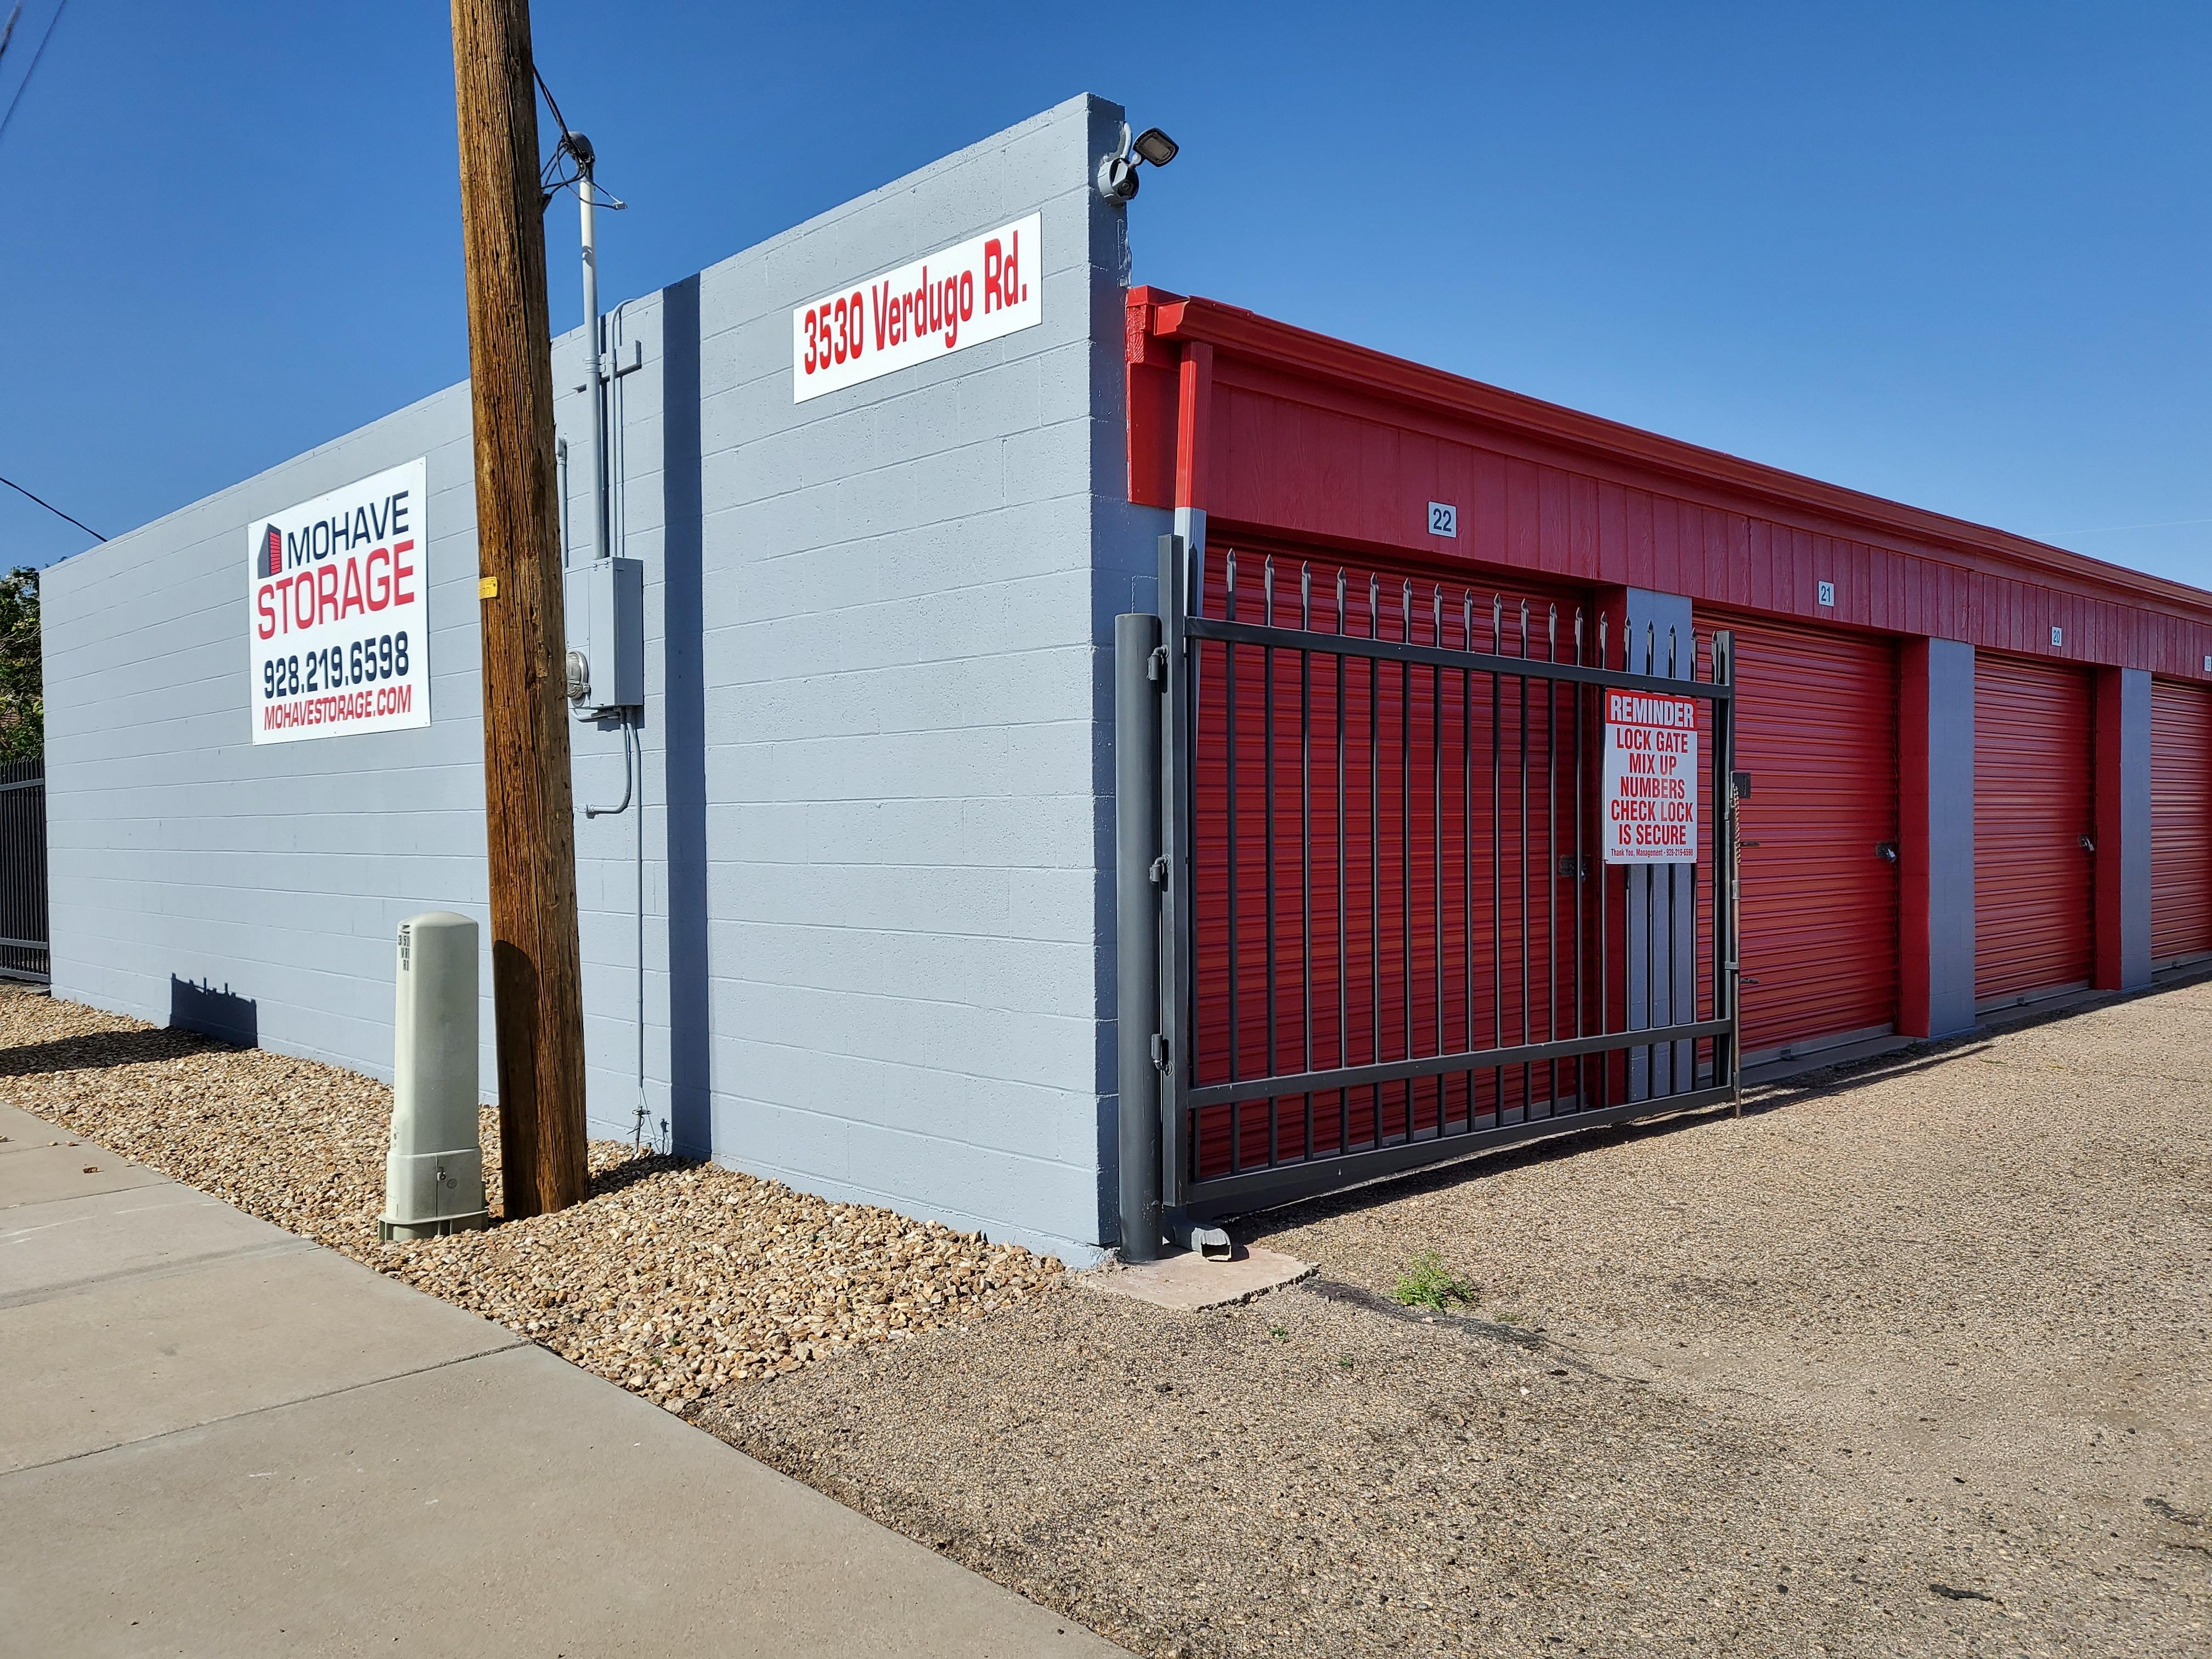 VERDUGO Rd. Kingman Gate Entrance Mohave Storage